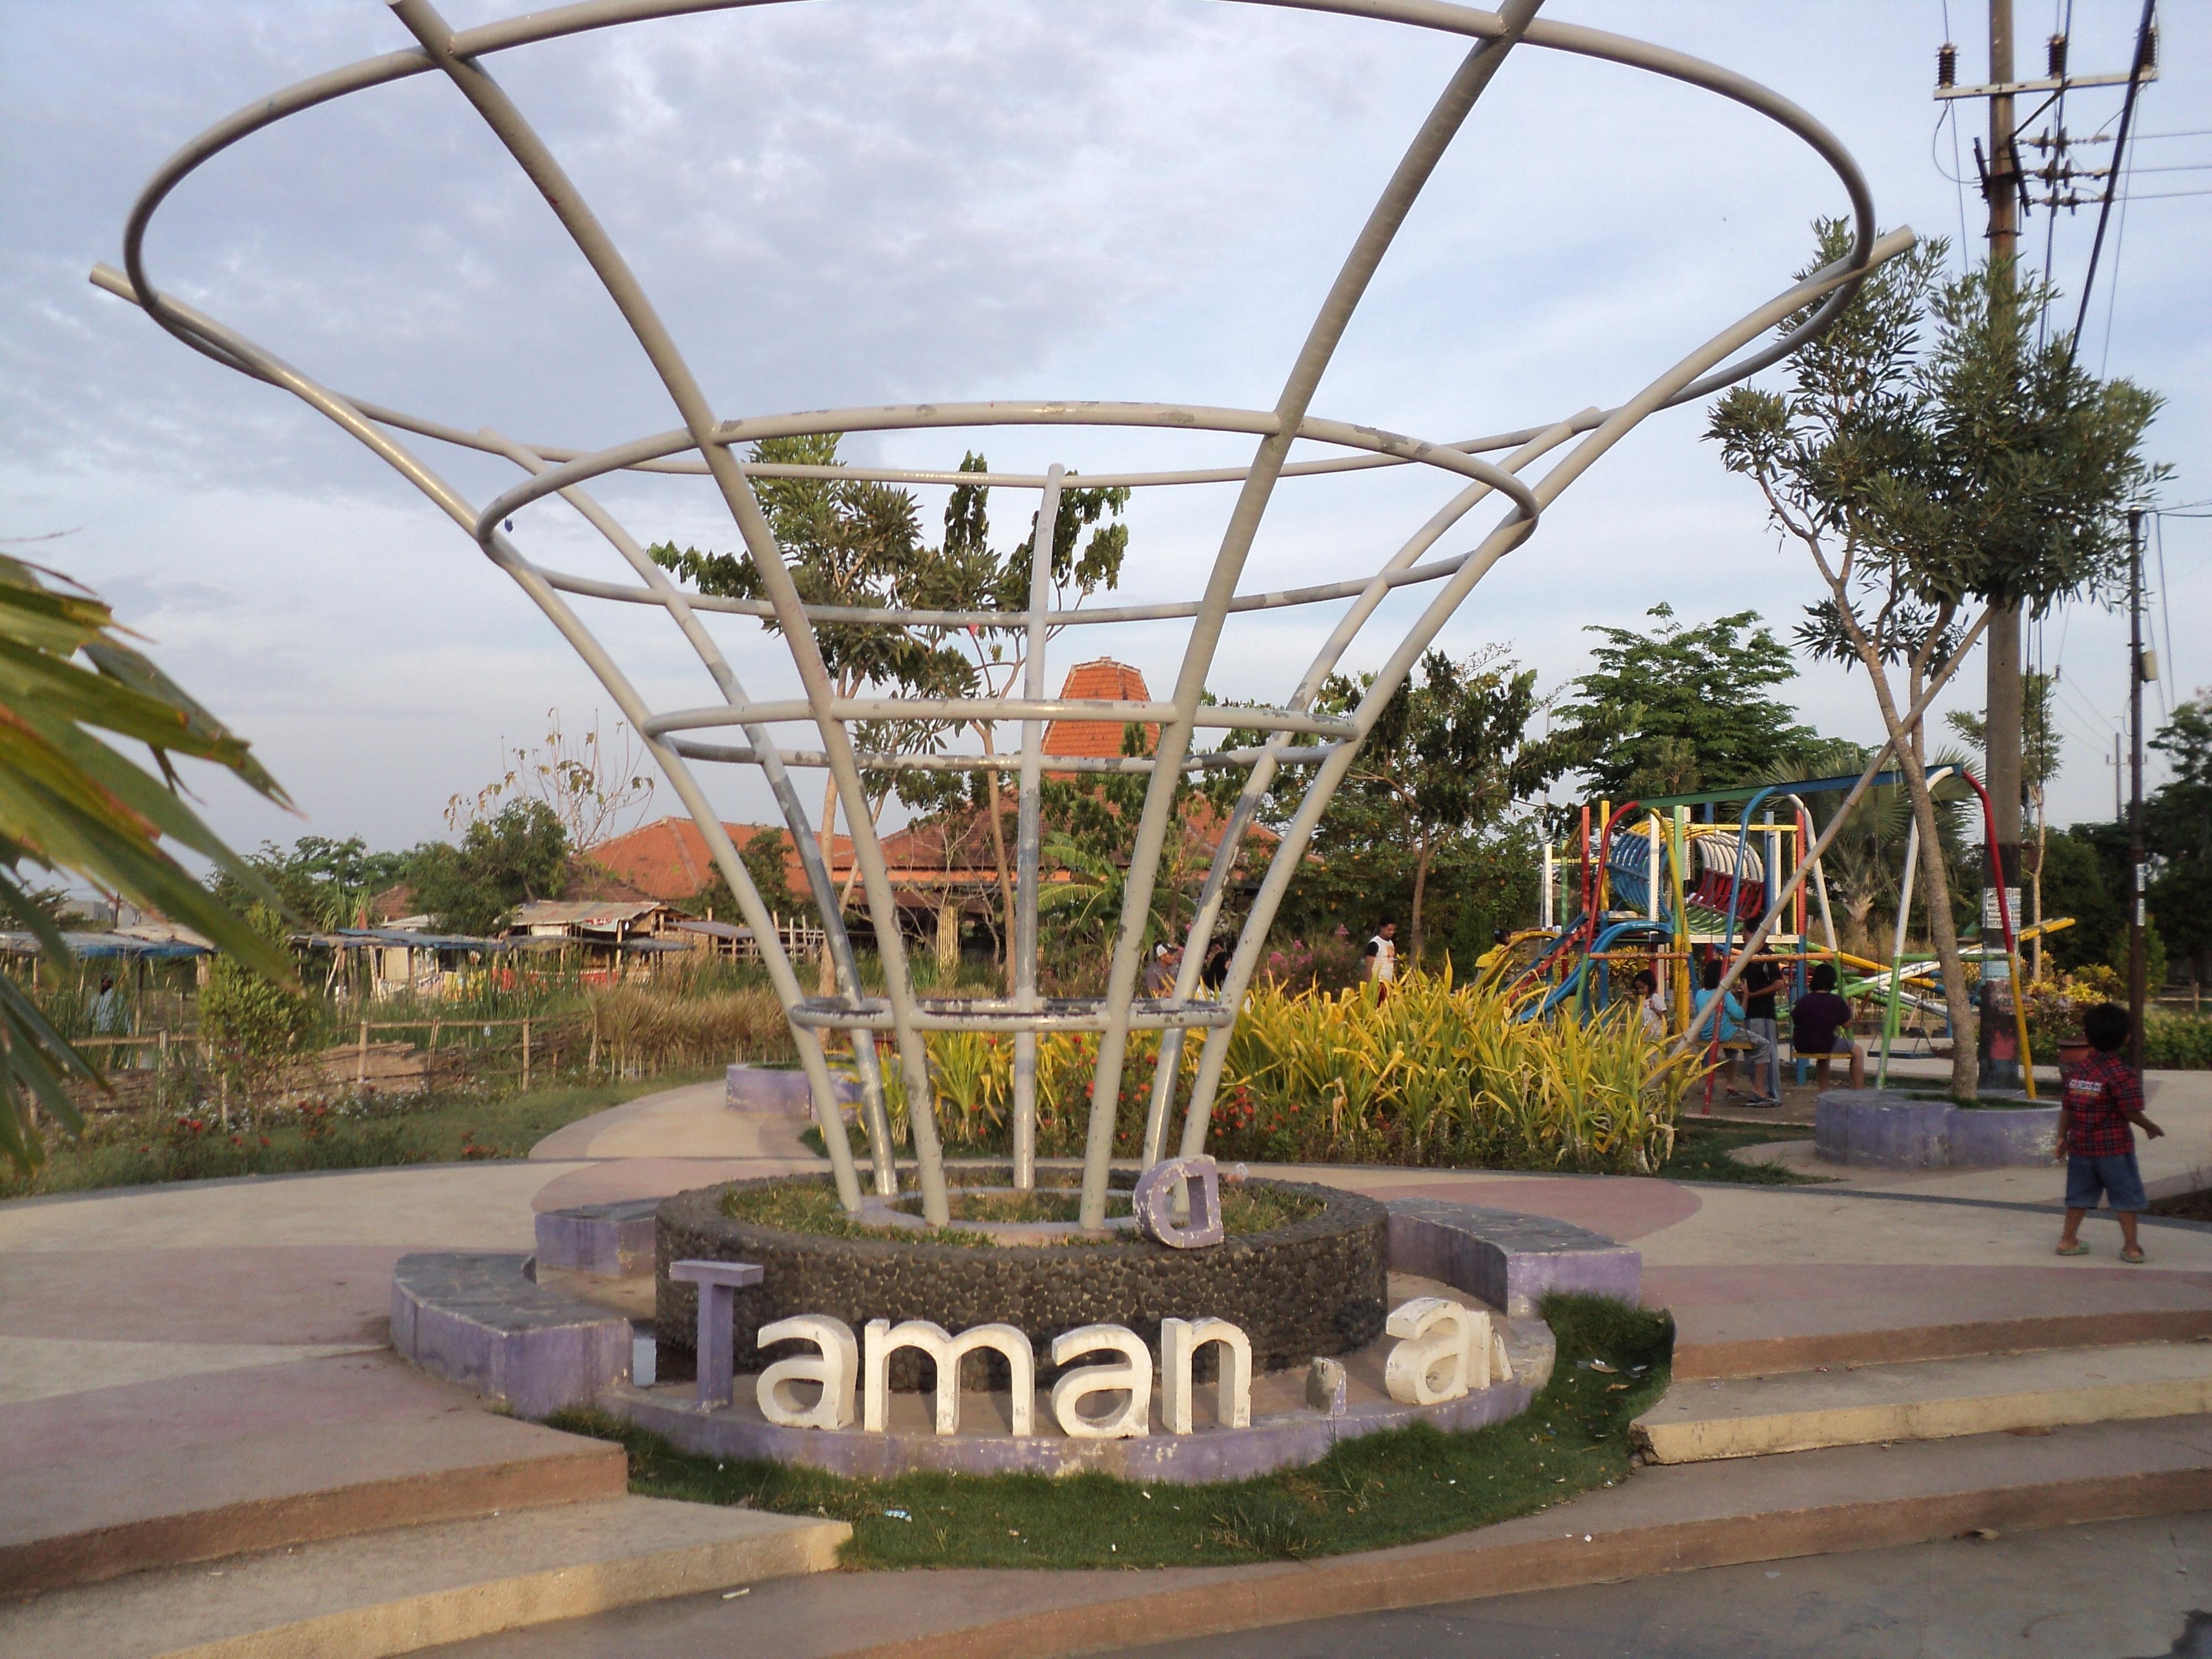 Taman Surabaya Barat Pesona Kota Gapura Pakal Mundu